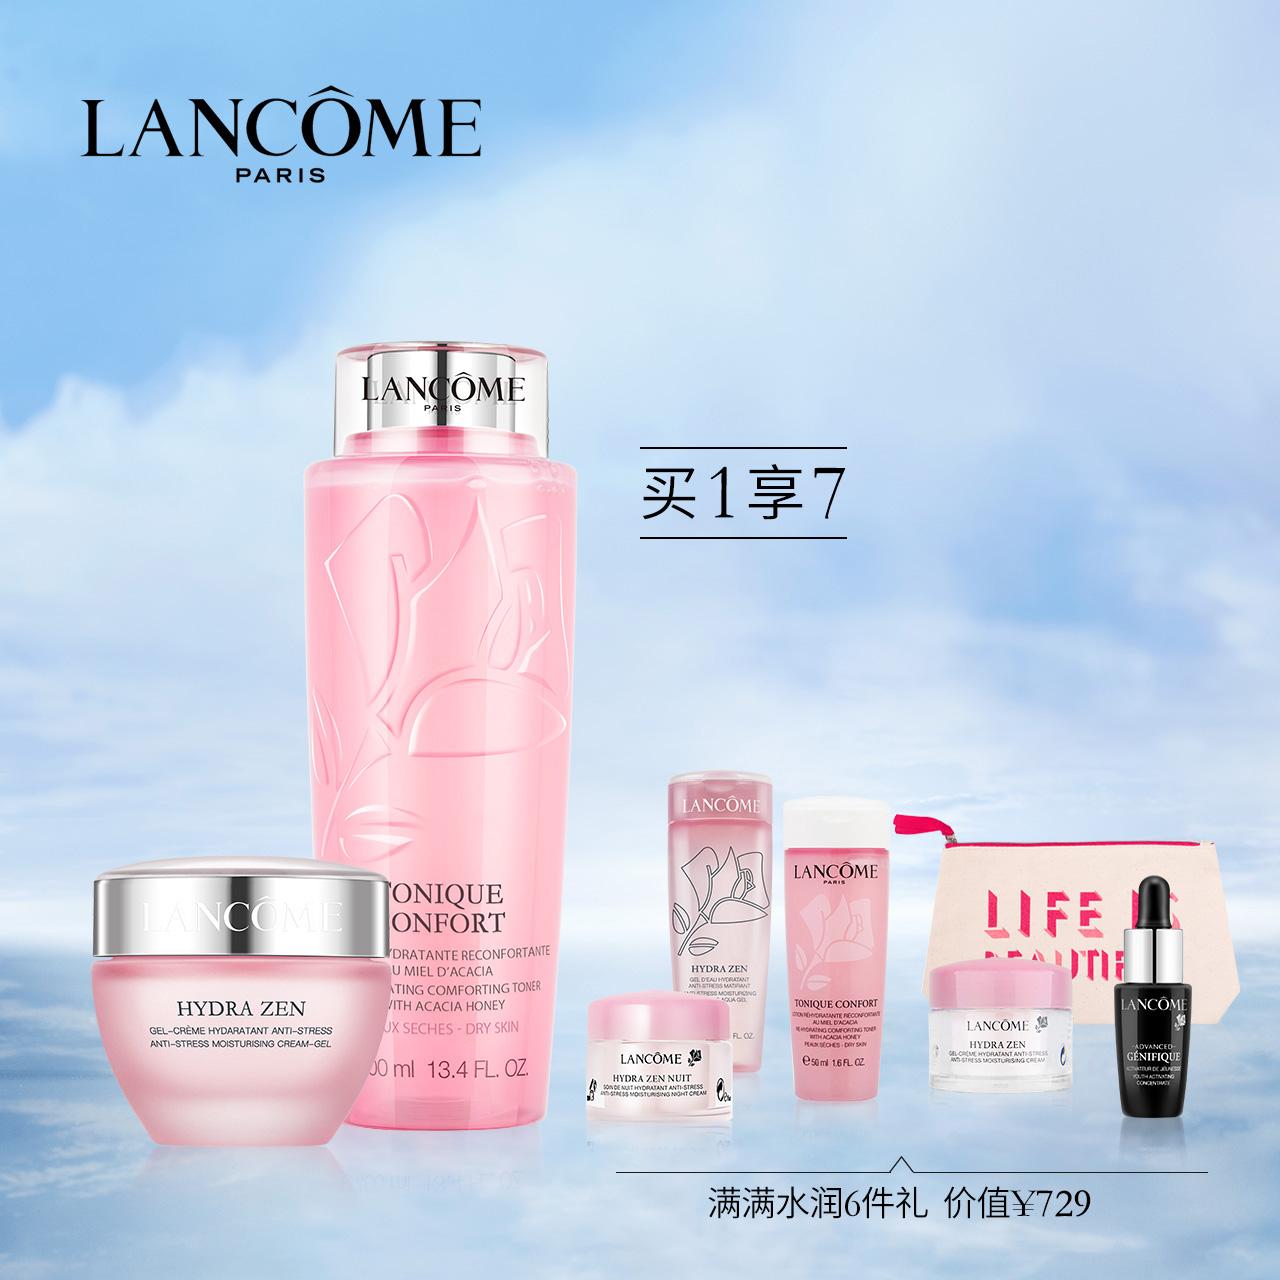 Usd 26156 Lancome Large Powder Water 400ml Moisture Edge Soothing Lancme Hydra Zen Anti Stress Moisturising Cream Gel 50ml Moisturizing Set Easy To Absorb